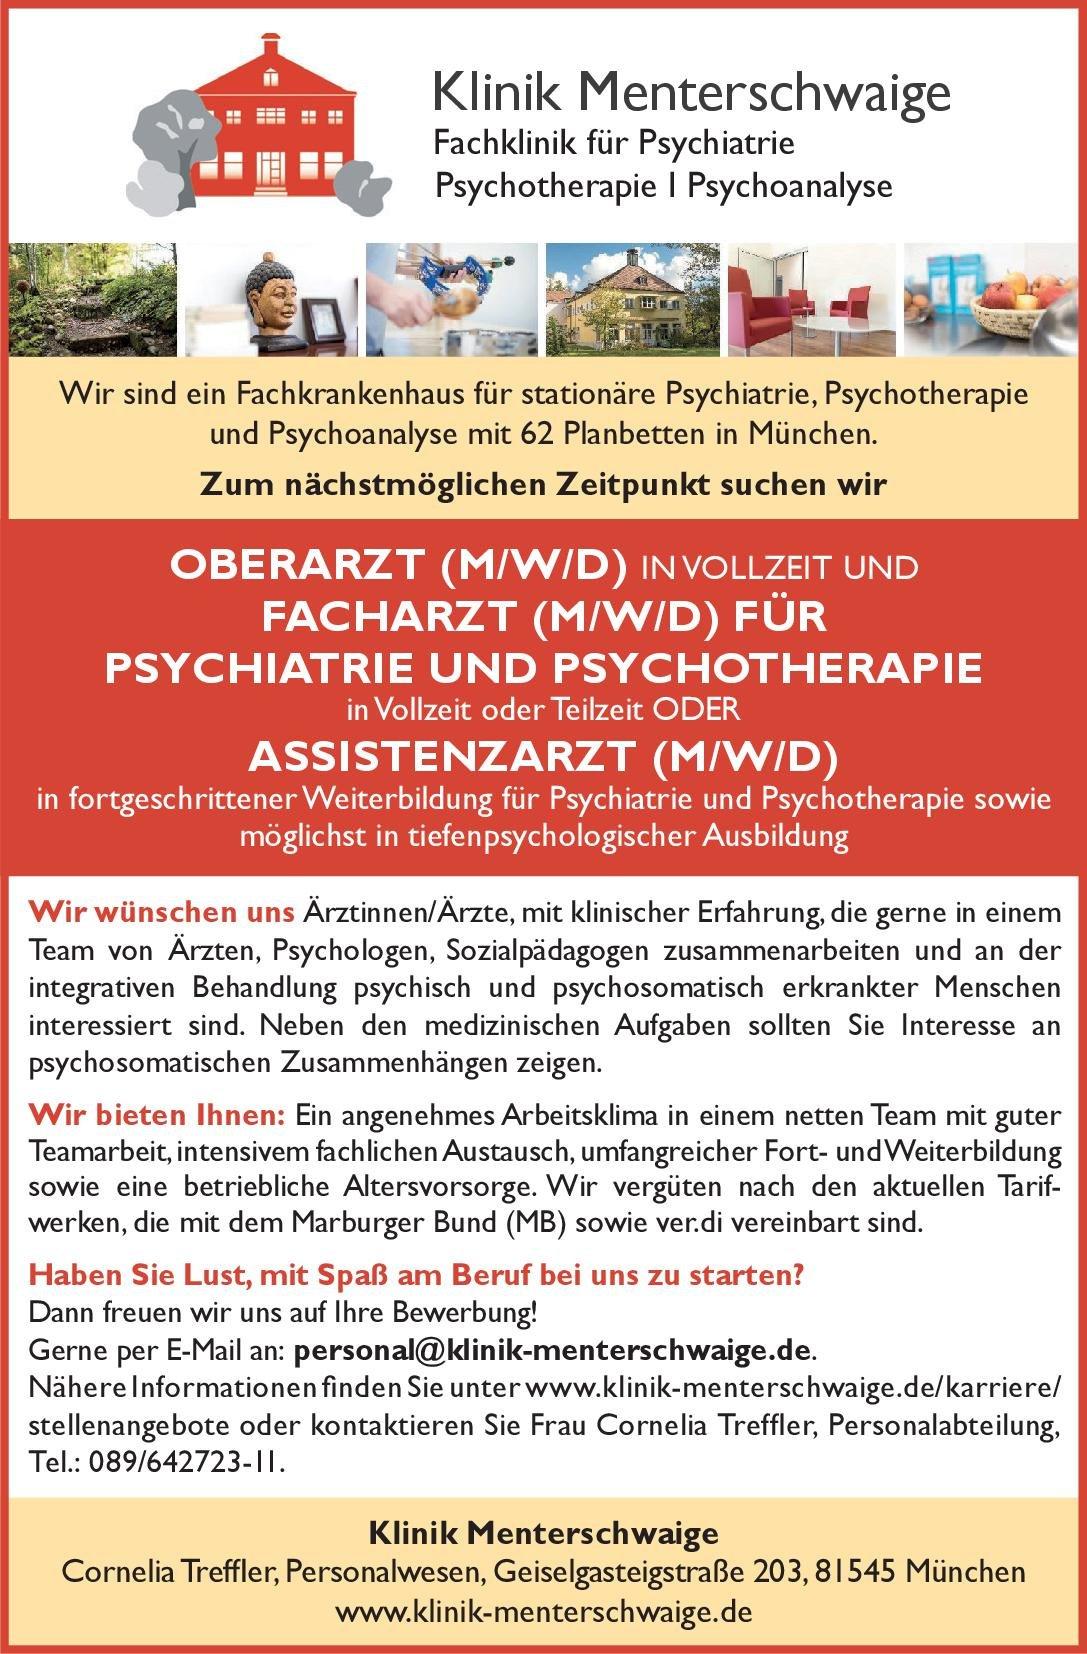 Klinik Menterschwaige Oberarzt (m/w/d) Psychiatrie und Psychotherapie  Psychiatrie und Psychotherapie, Psychiatrie und Psychotherapie Oberarzt